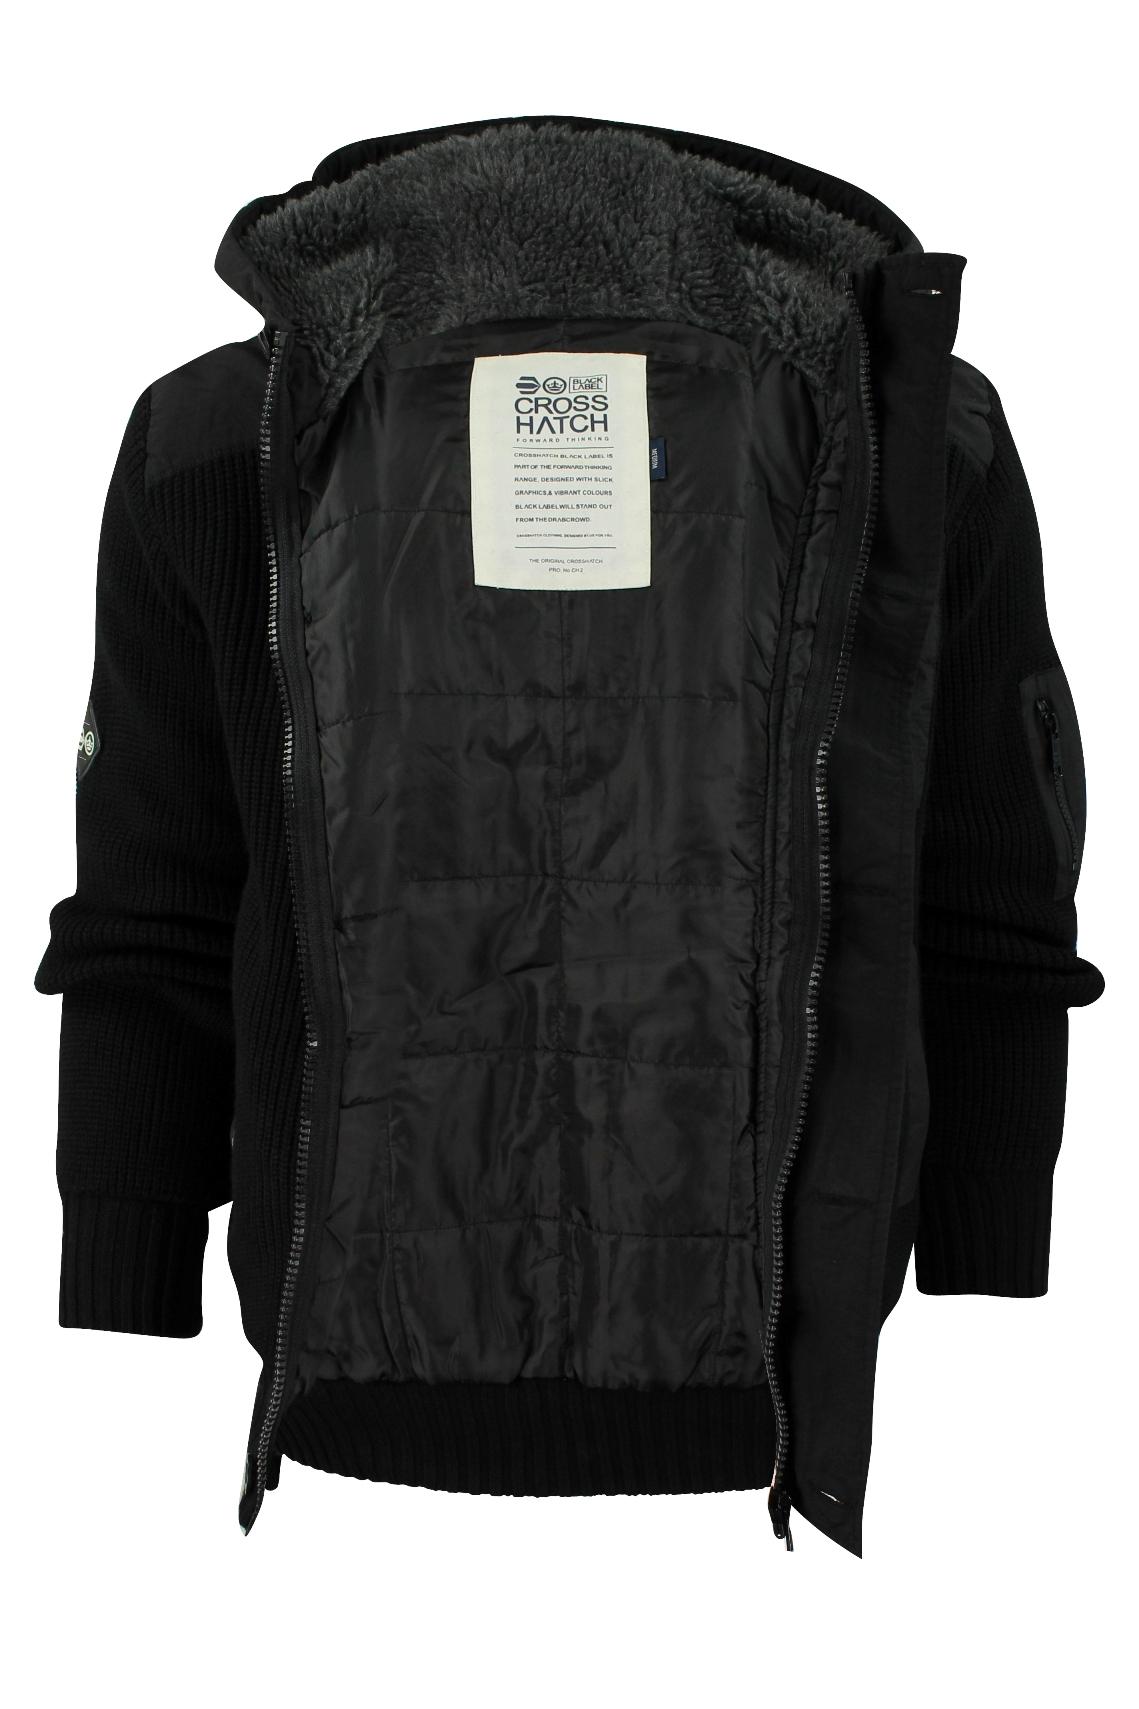 2e1d27841a3 Mens Rib Zip Cardigan Jumper Crosshatch Tarlet Hoodie Fur Lined .